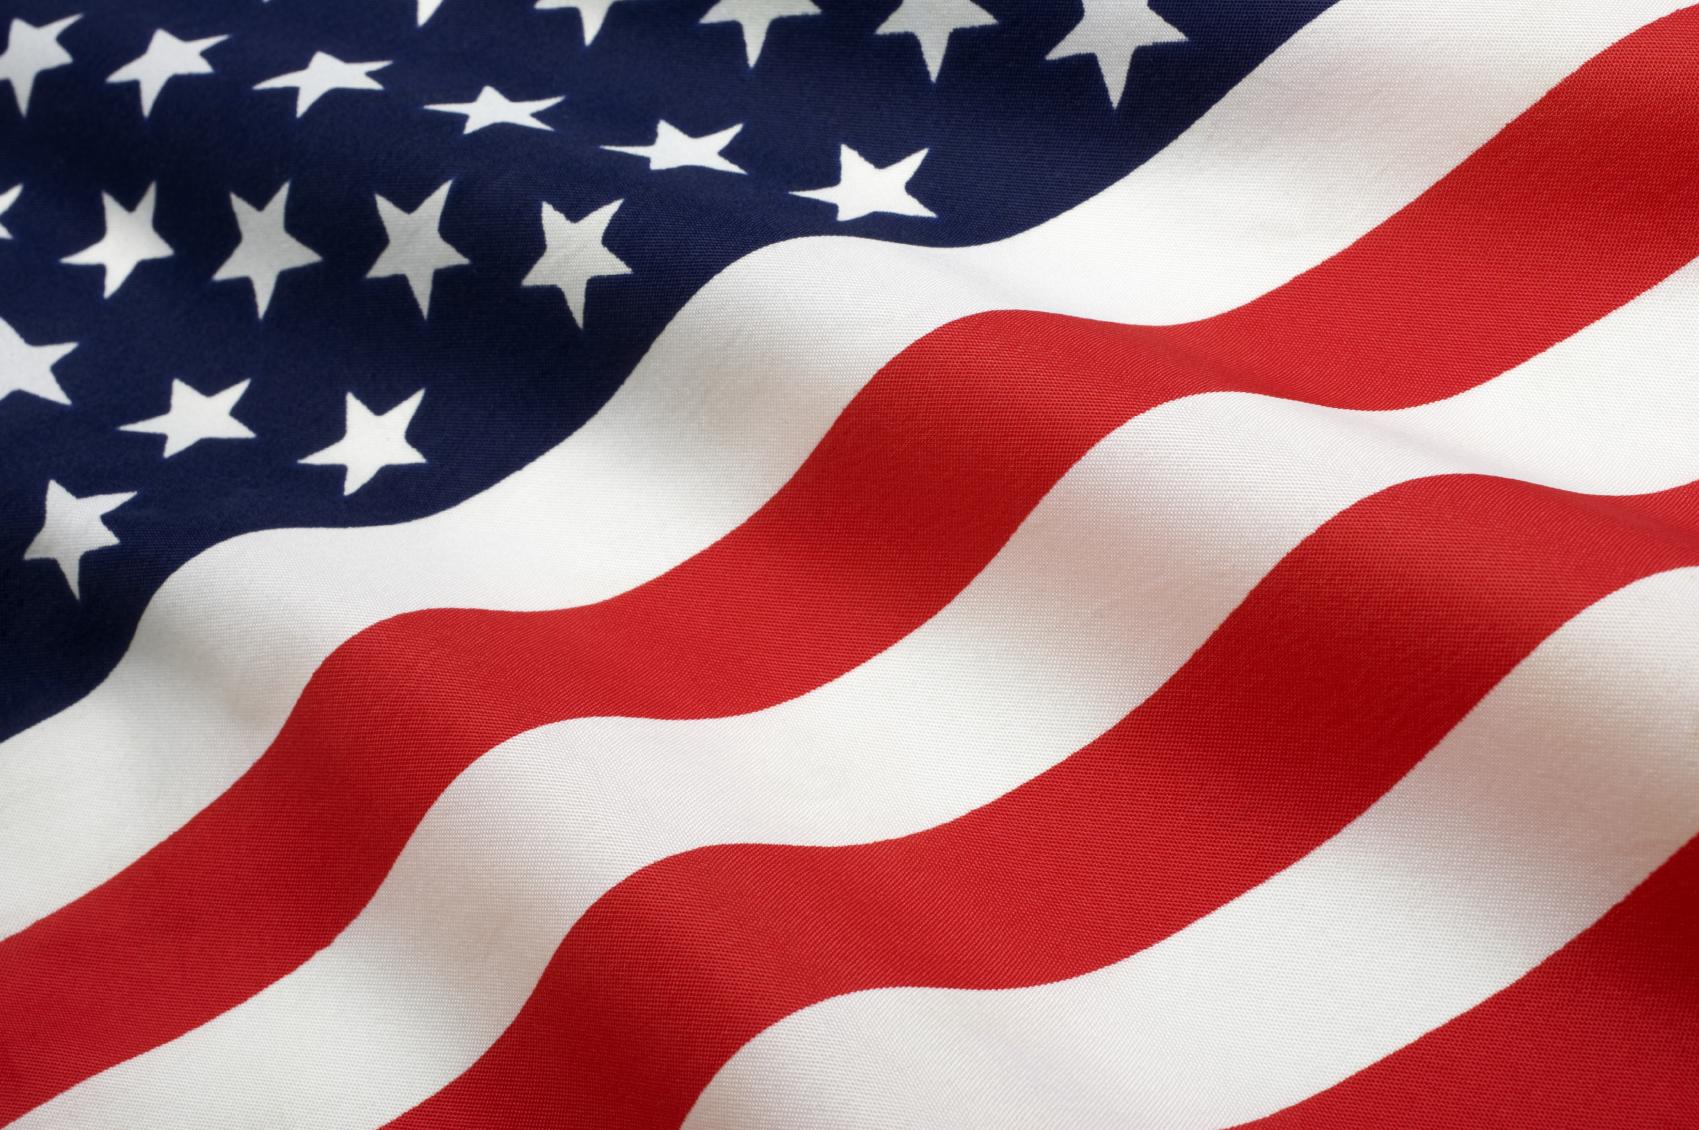 american flag american flag american flag american flag american flag 1699x1130